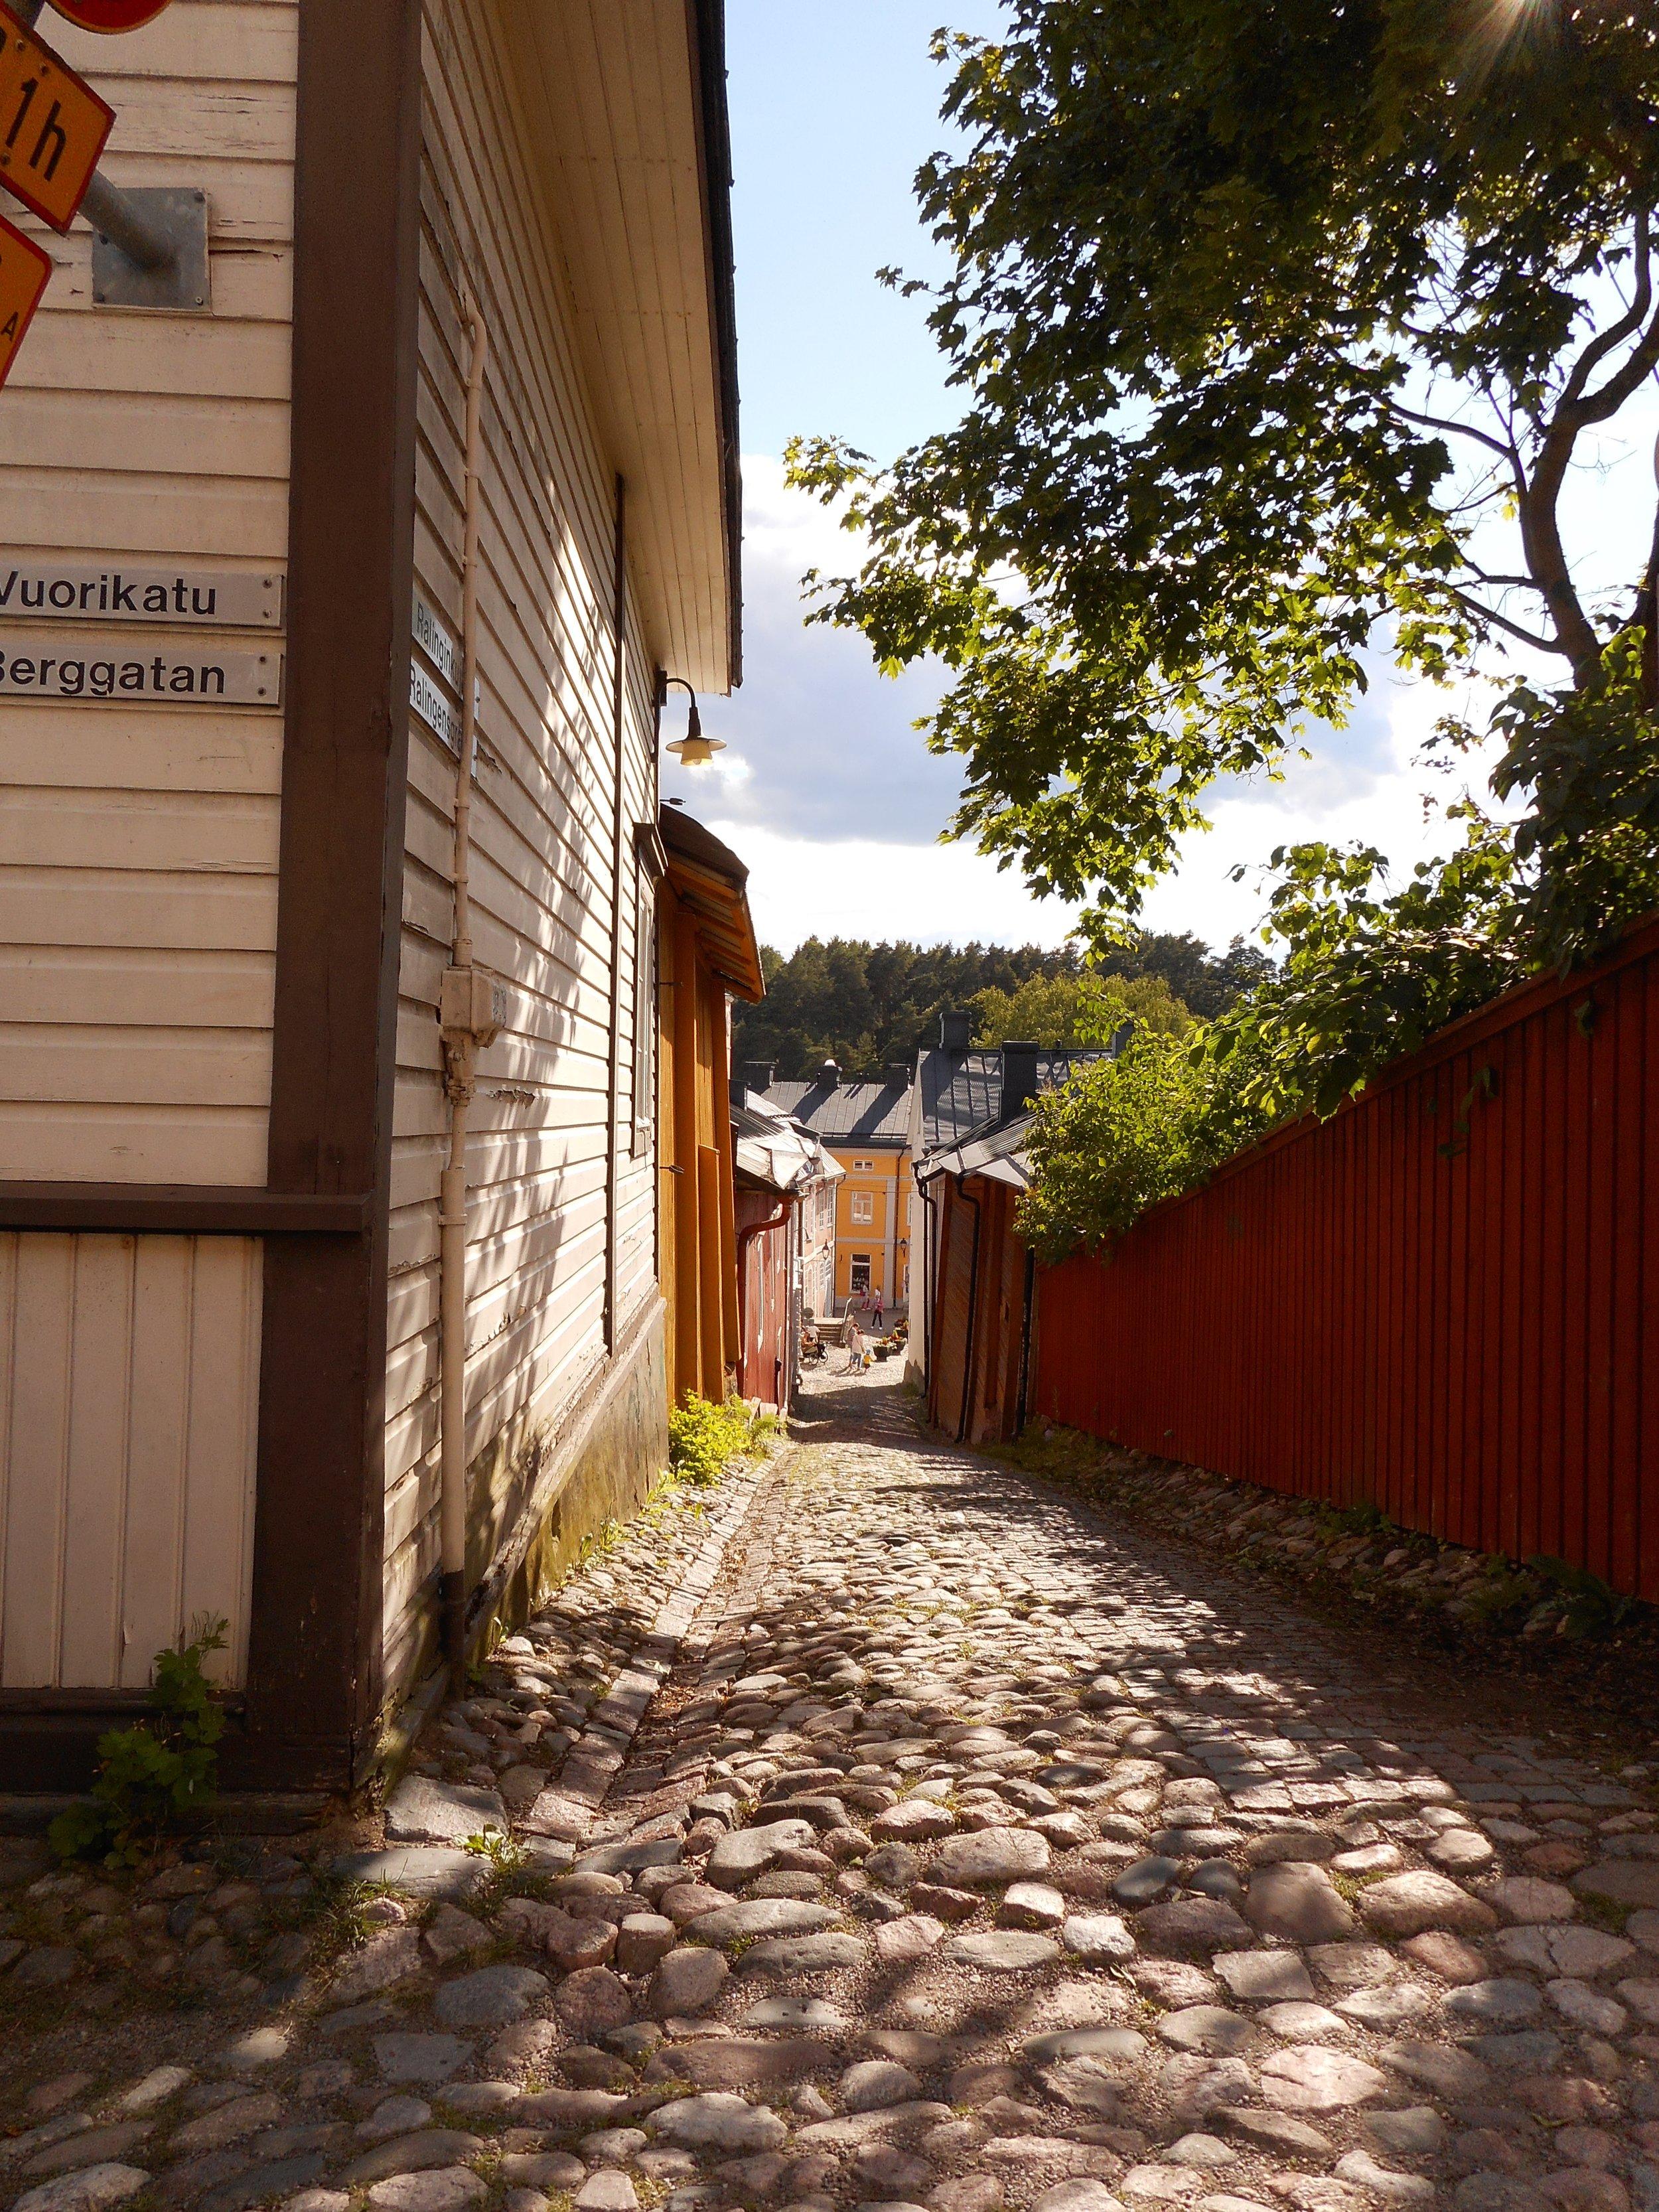 charming cobblestone street in Porvoo